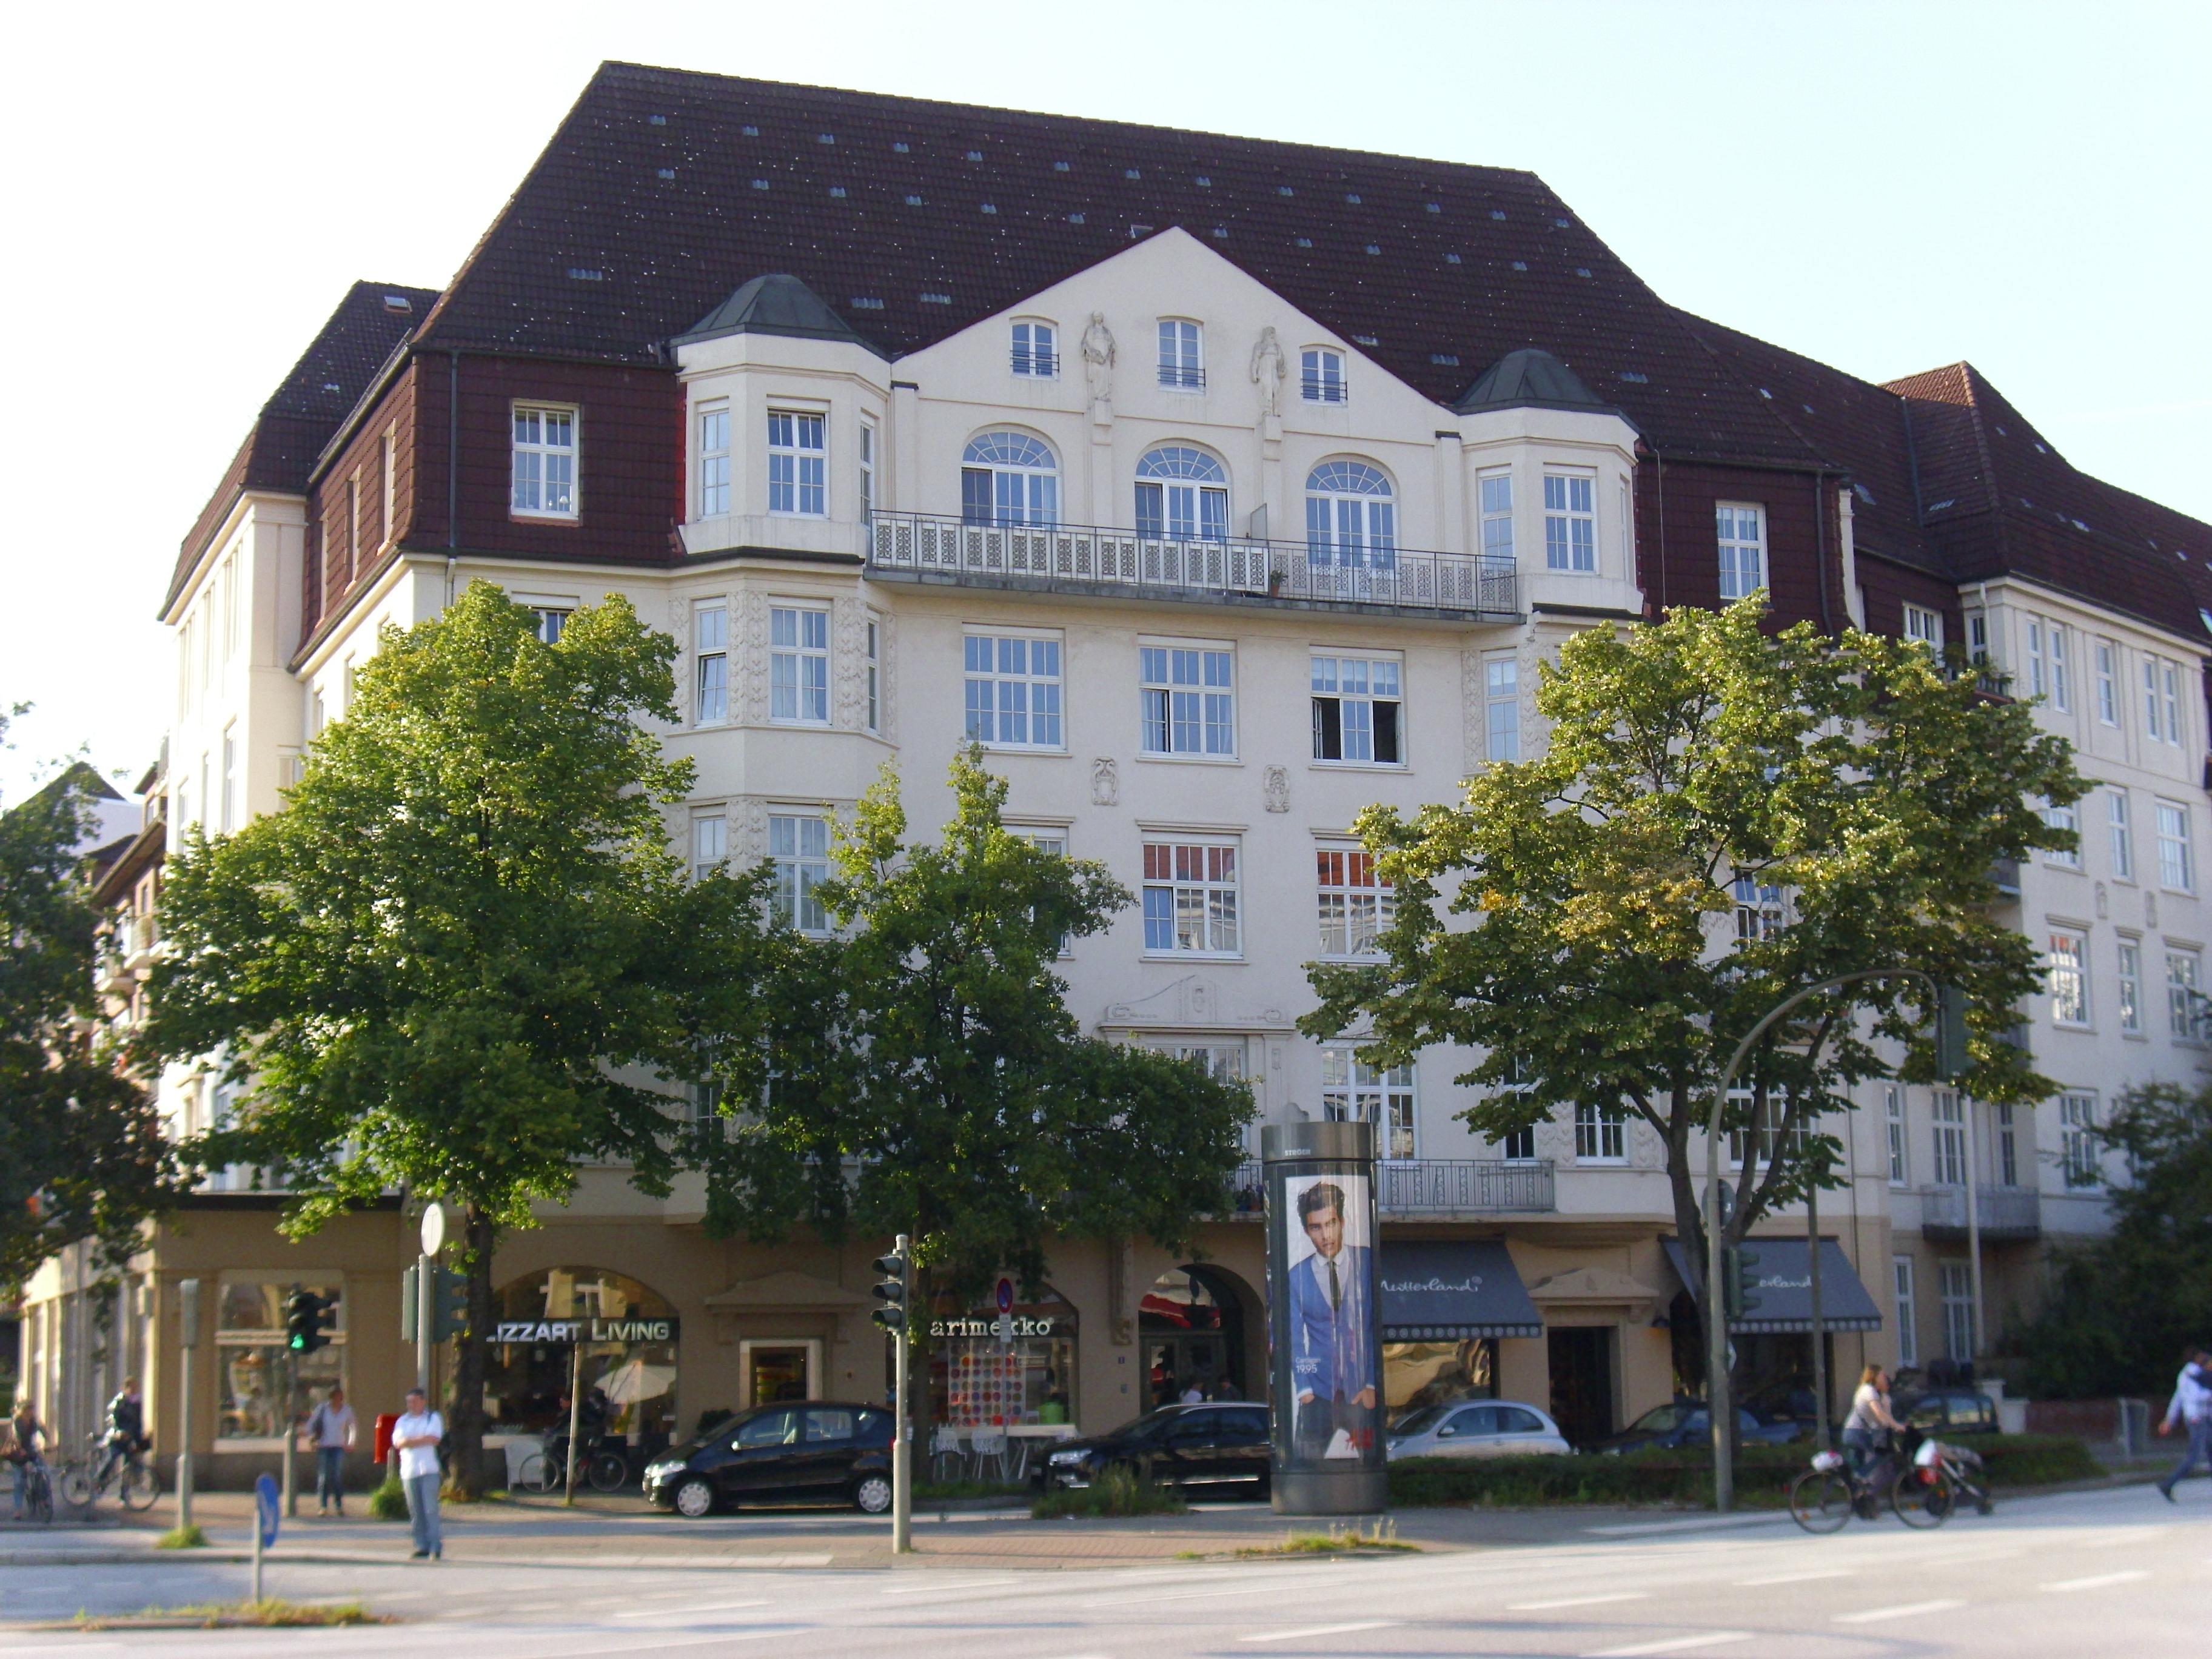 file eppendorferbaum palais hamburg eppendorf jpg wikimedia commons. Black Bedroom Furniture Sets. Home Design Ideas